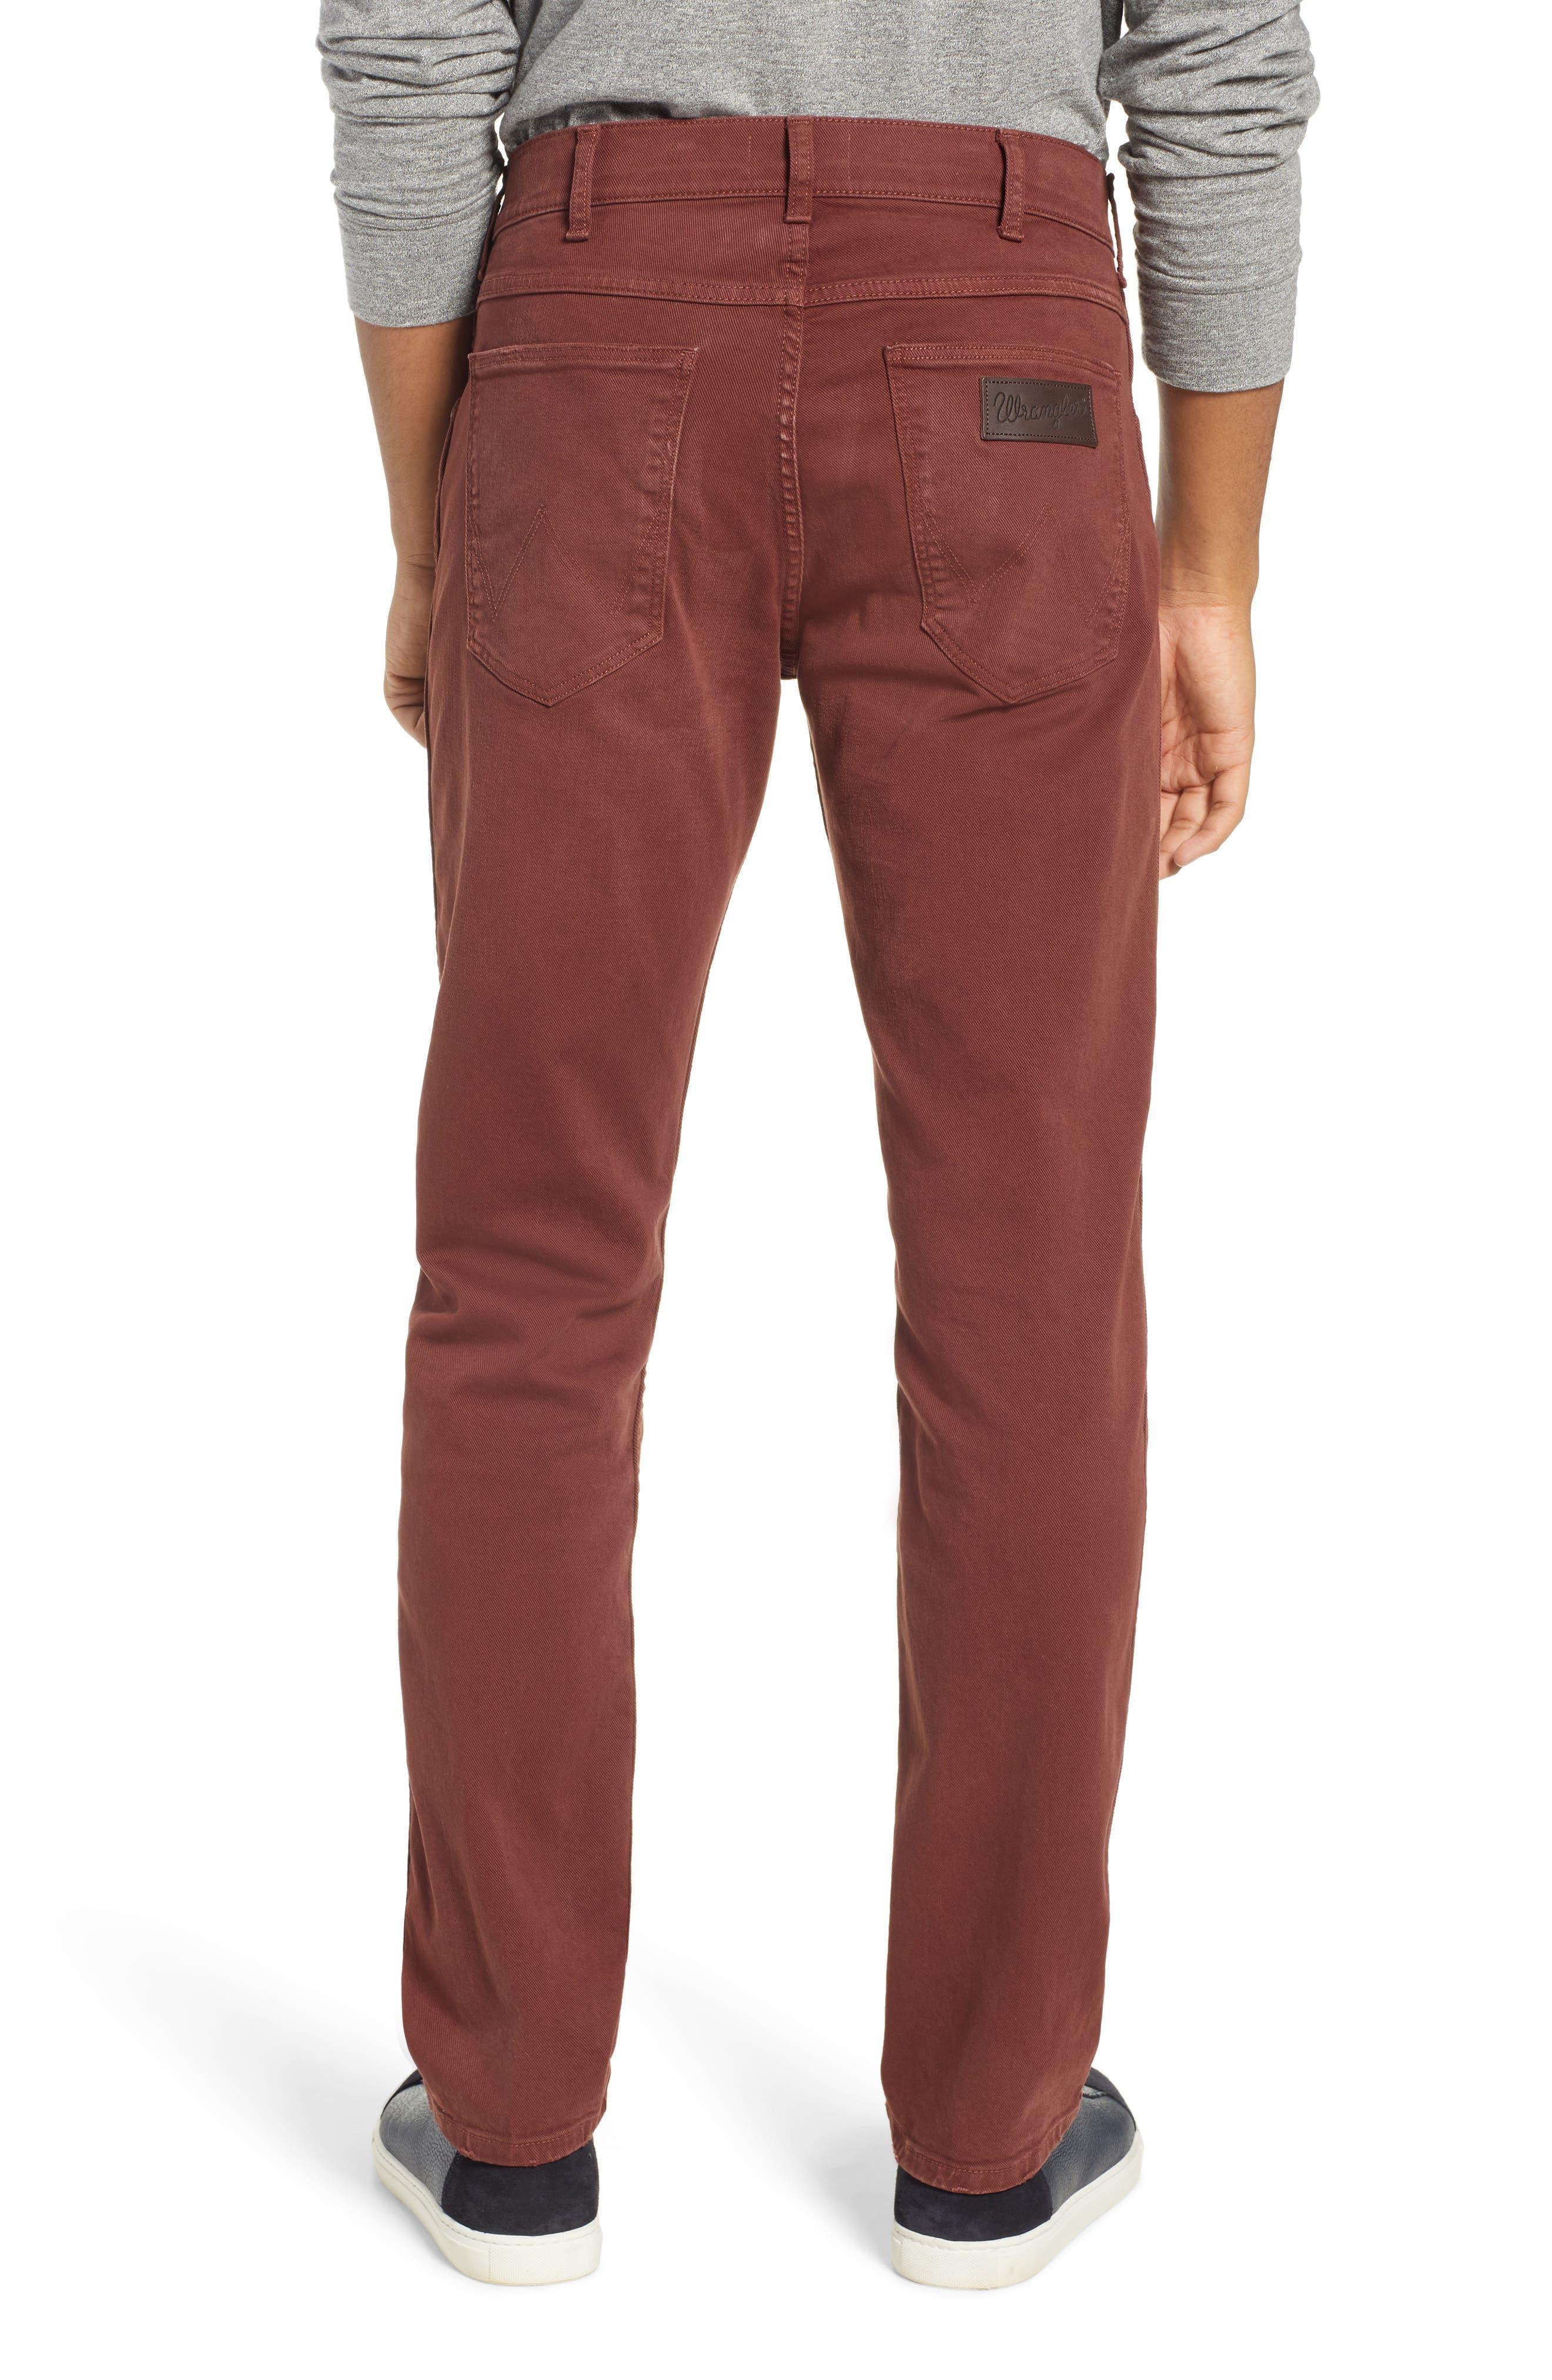 Greensboro Straight Leg Twill Pants,                             Alternate thumbnail 2, color,                             MAHOGANY RED